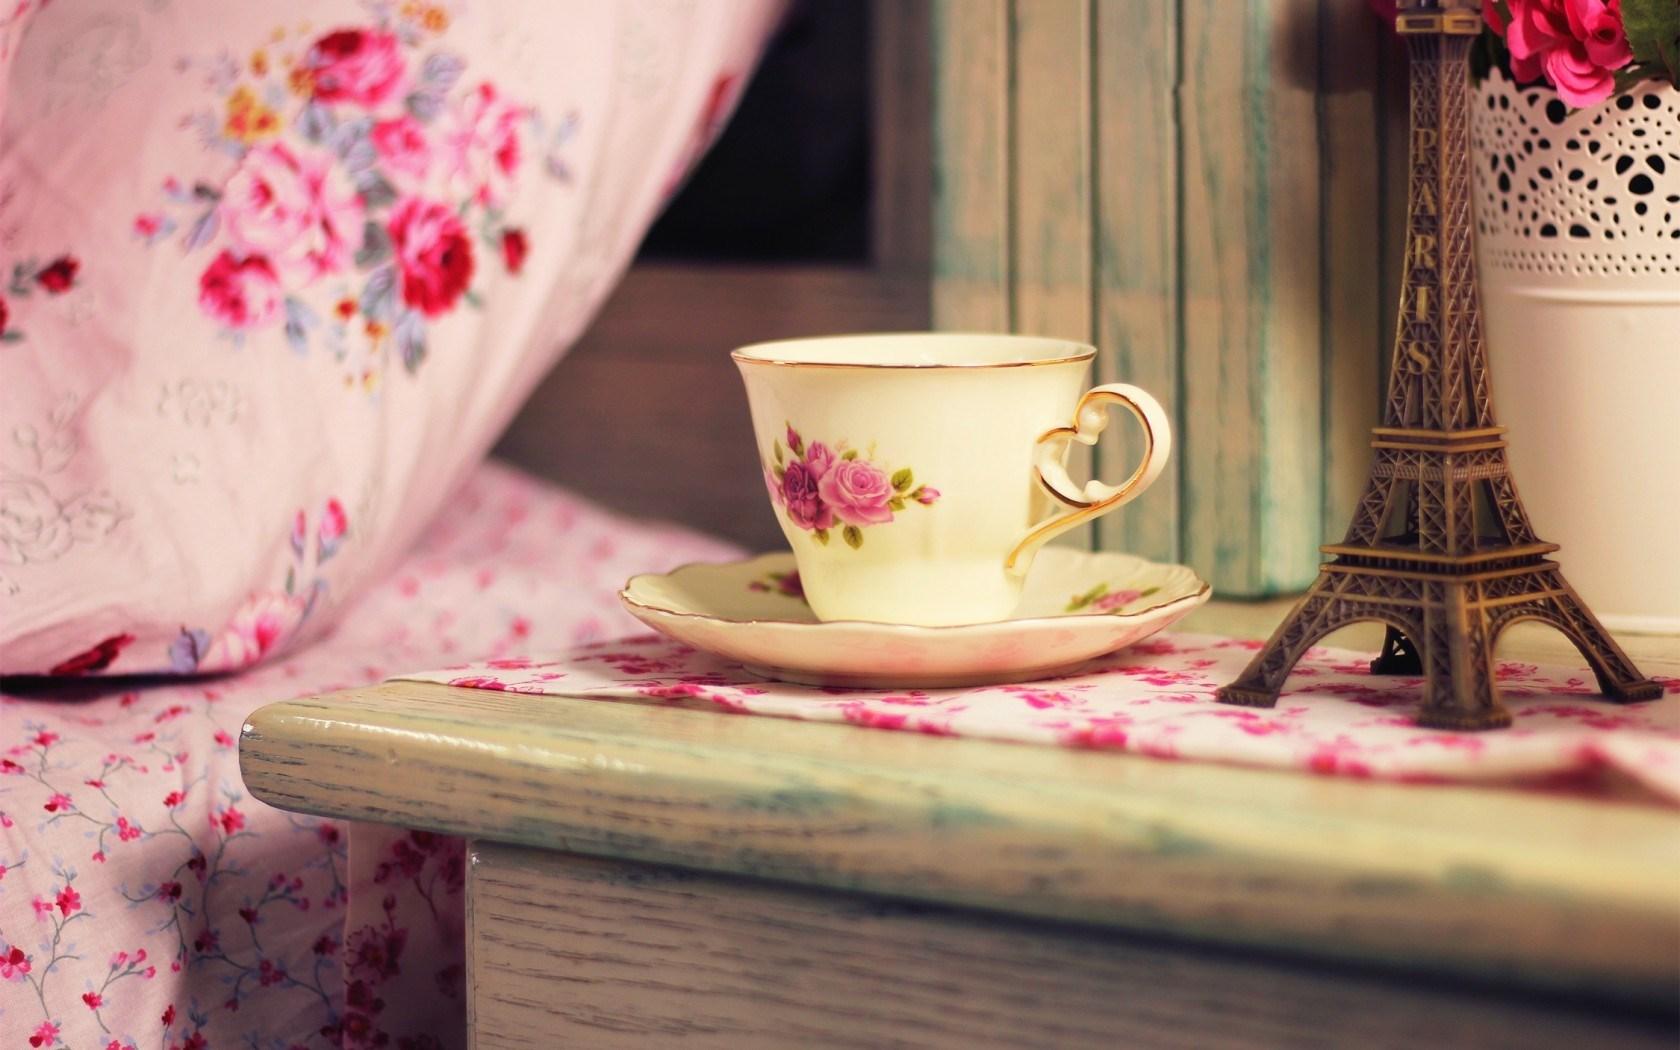 Cup Tea France Eiffel Tower Flowers